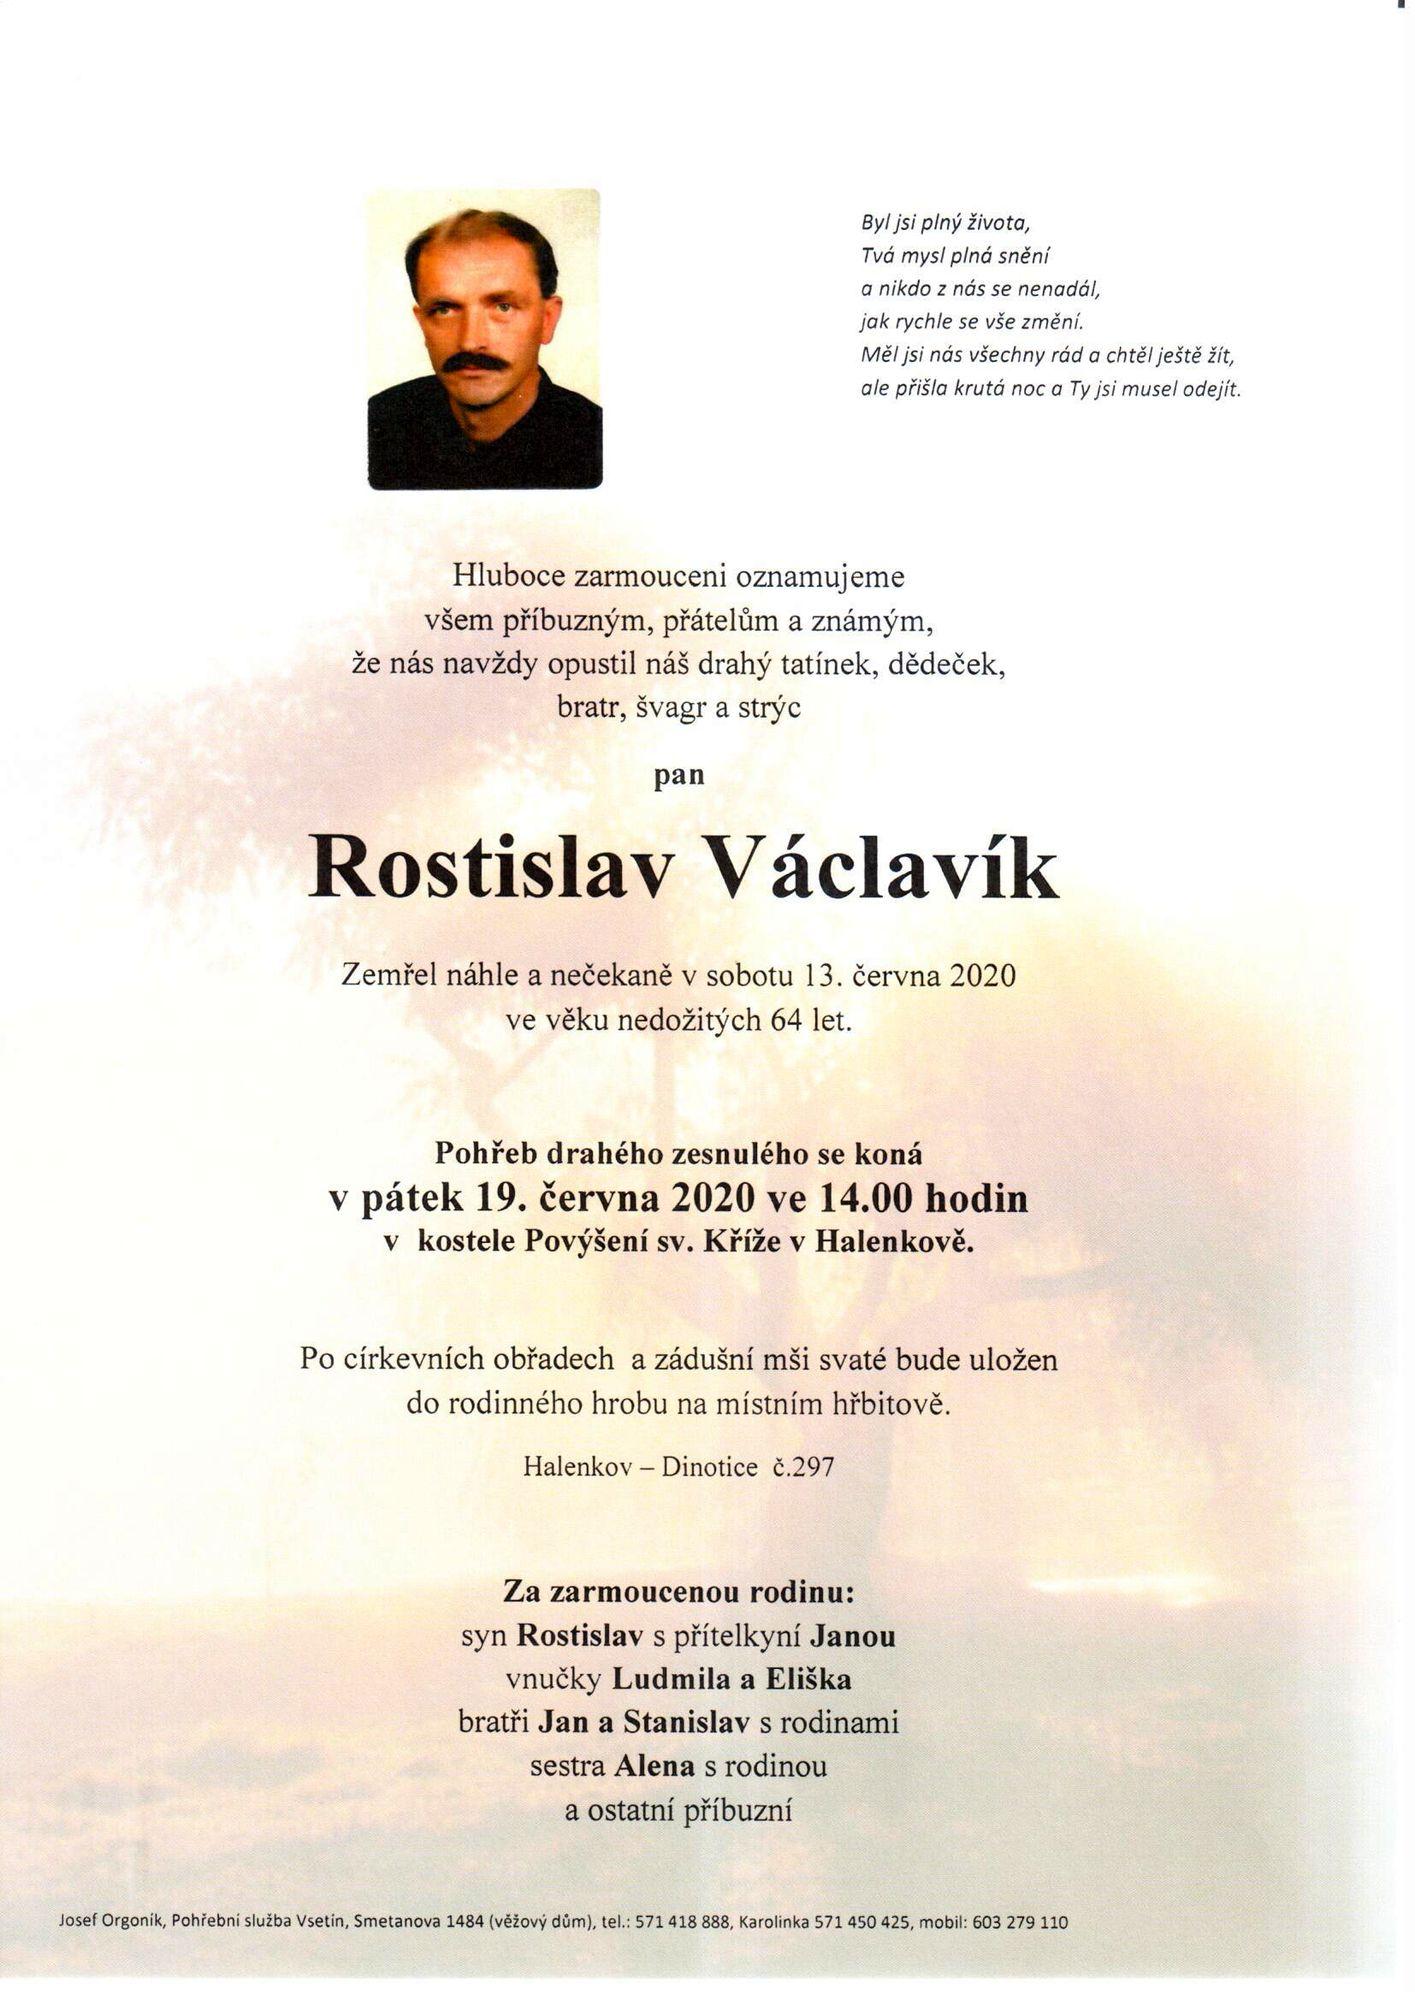 Rostislav Václavík